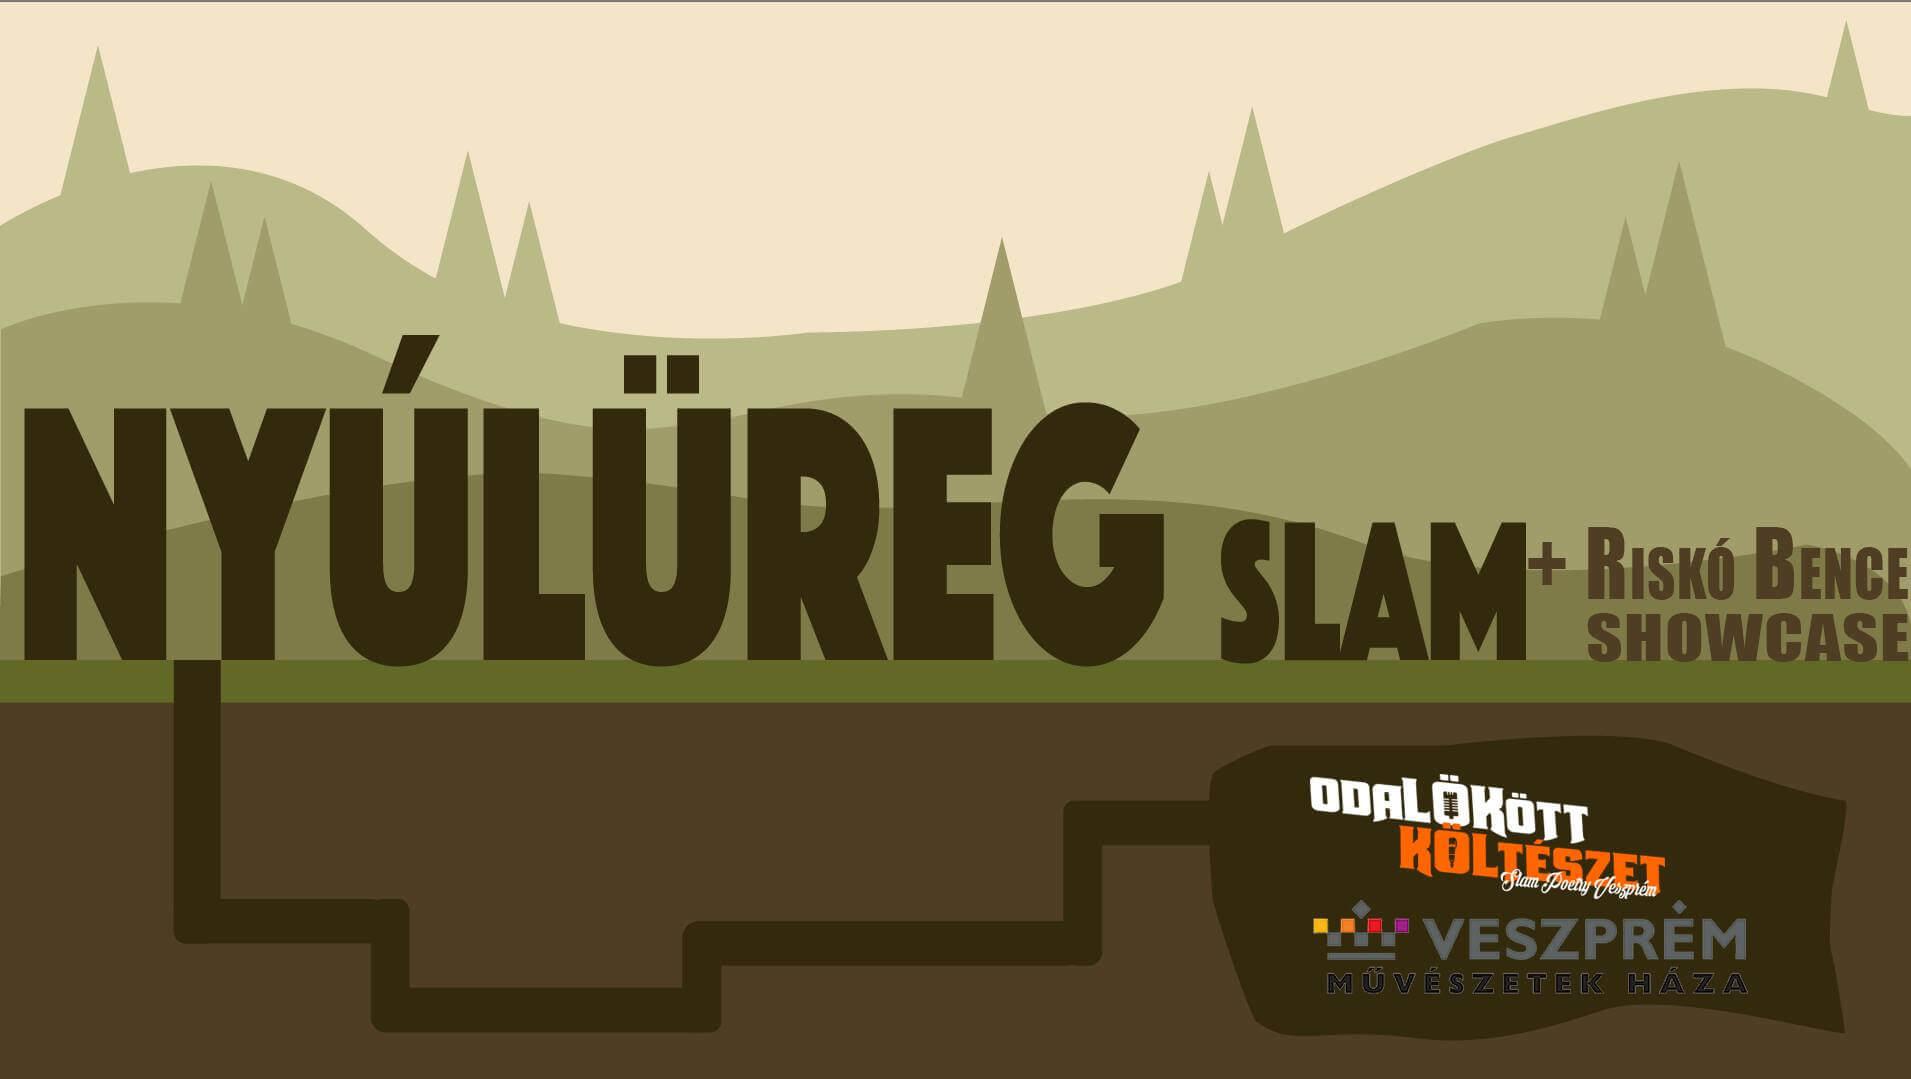 Nyúlüreg Slam + Riskó Bence-showcase